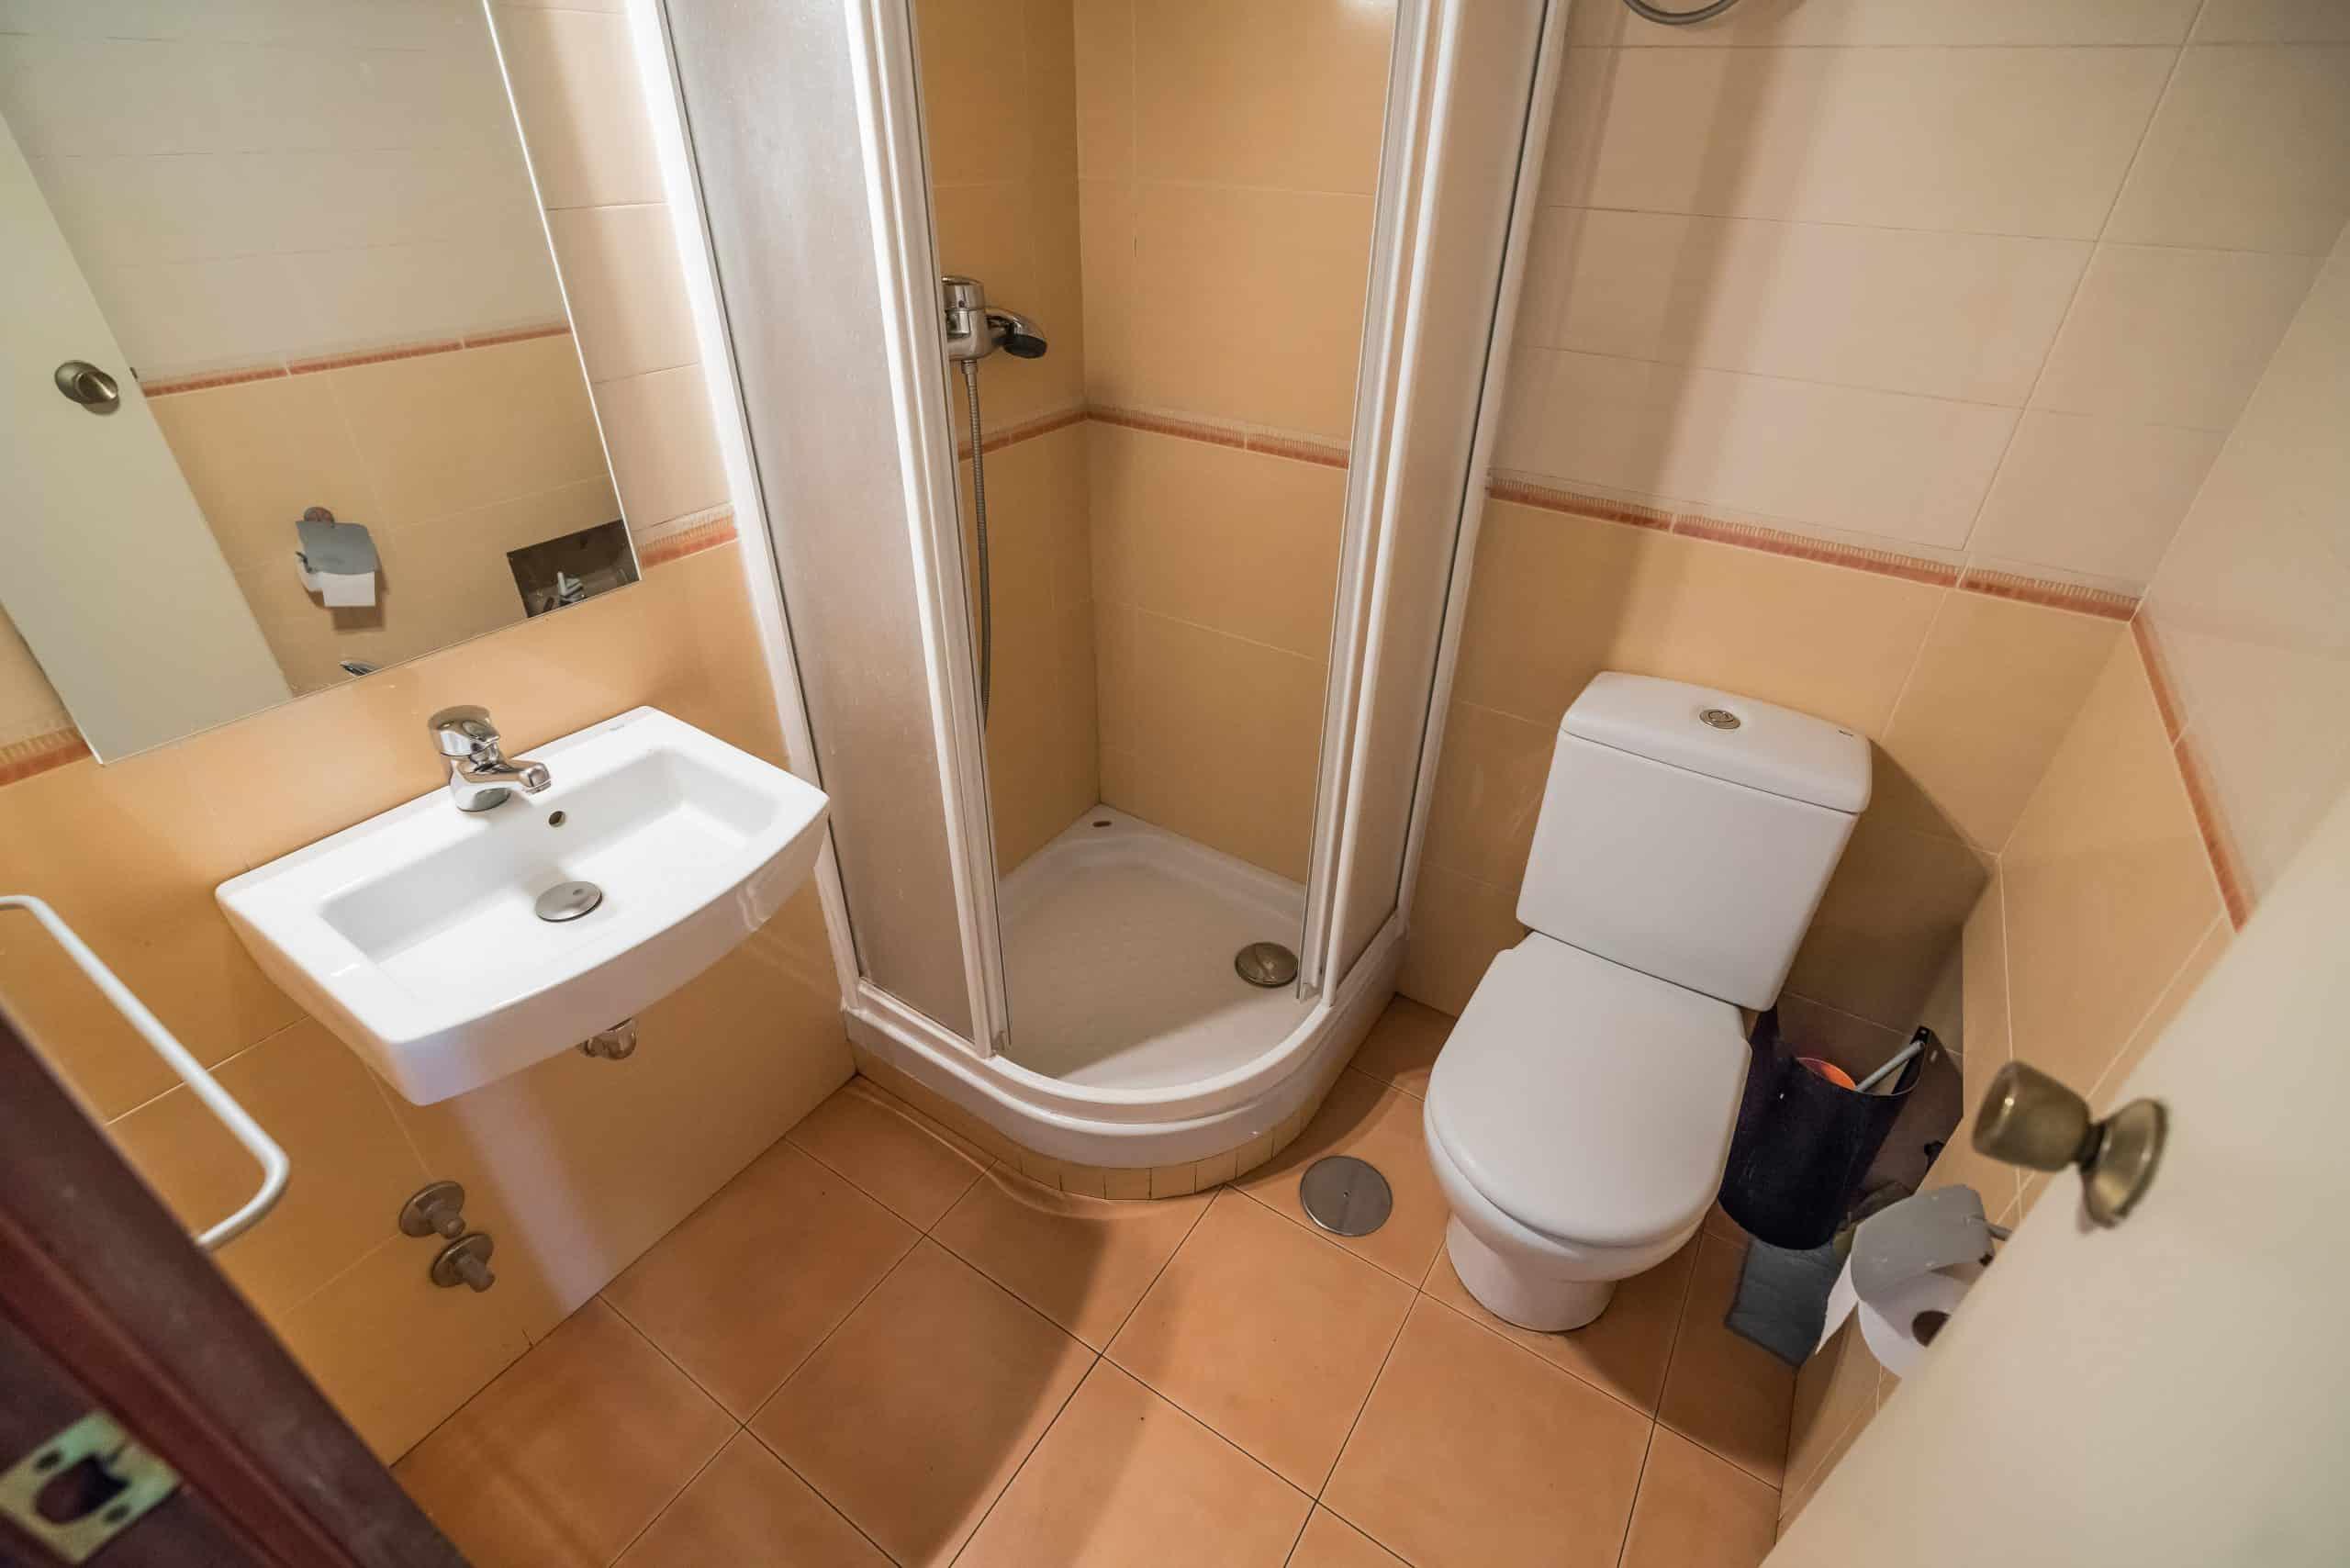 Agencia Inmobiliaria de Madrid-FUTUROCASA-Zona ARGANZUELA-EMBAJADORES-LEGAZPI -calle Embajadores- baño 154